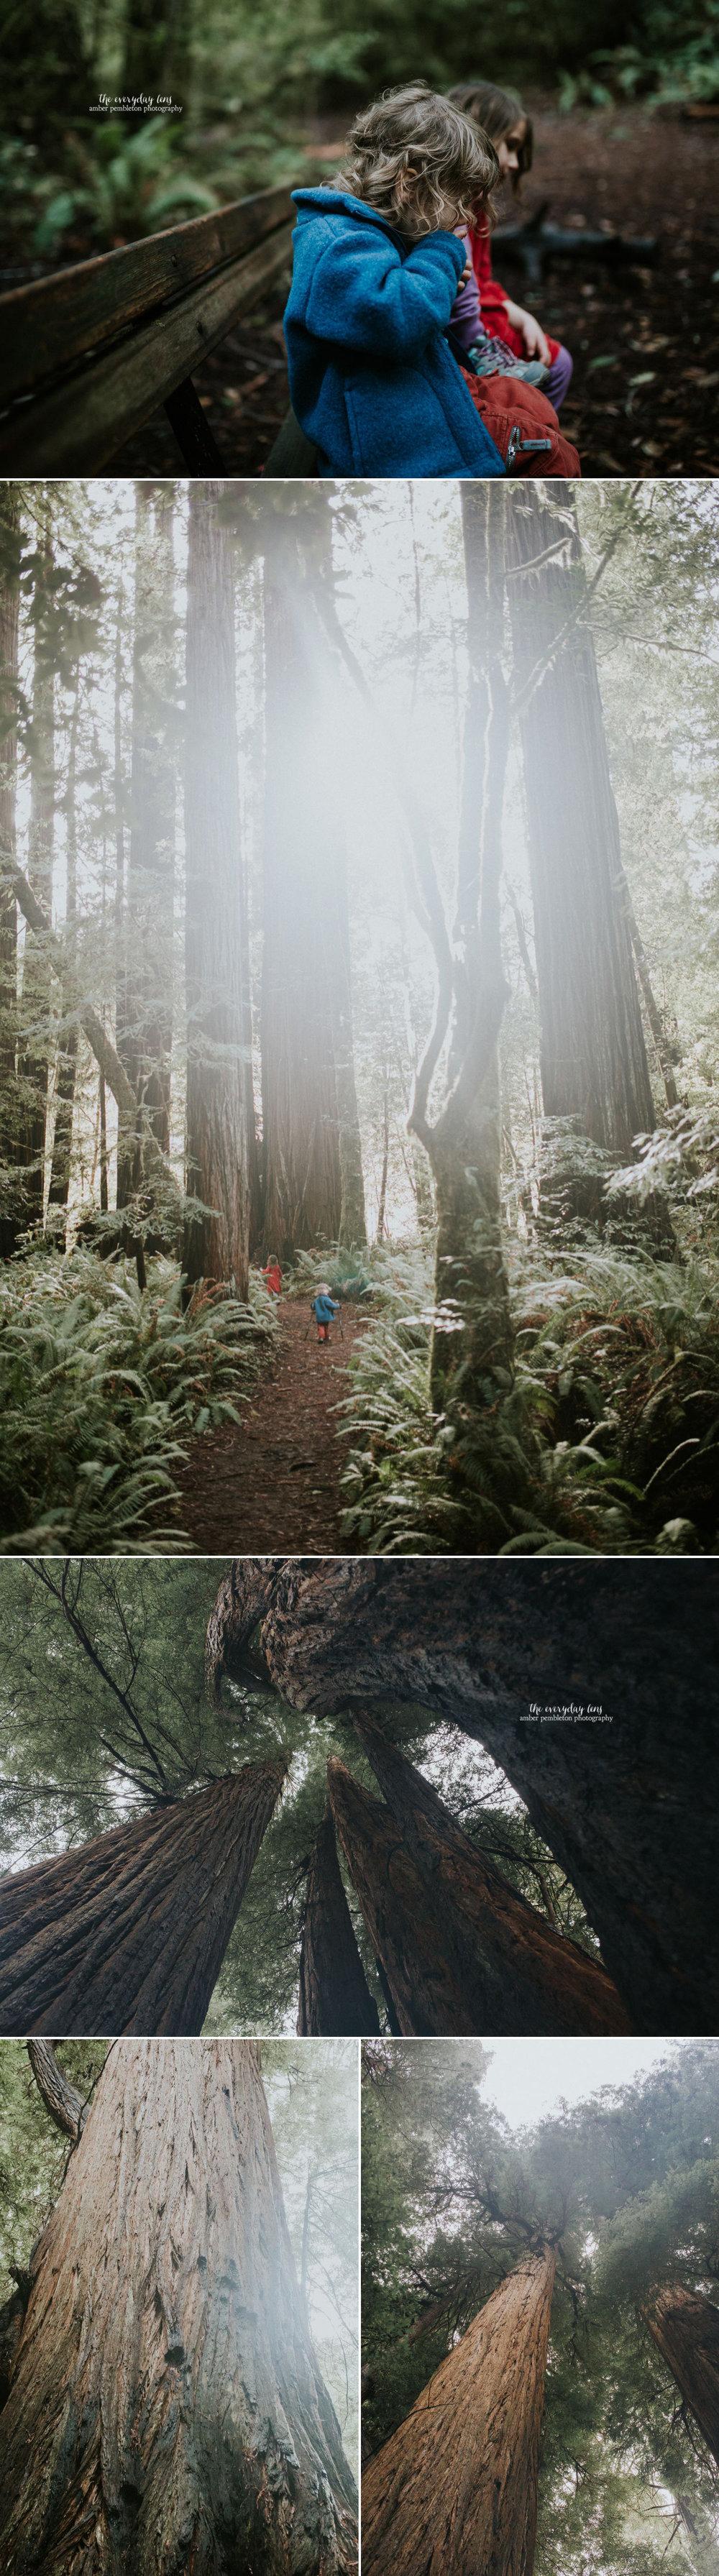 kids-who-hike-redwoods.jpg